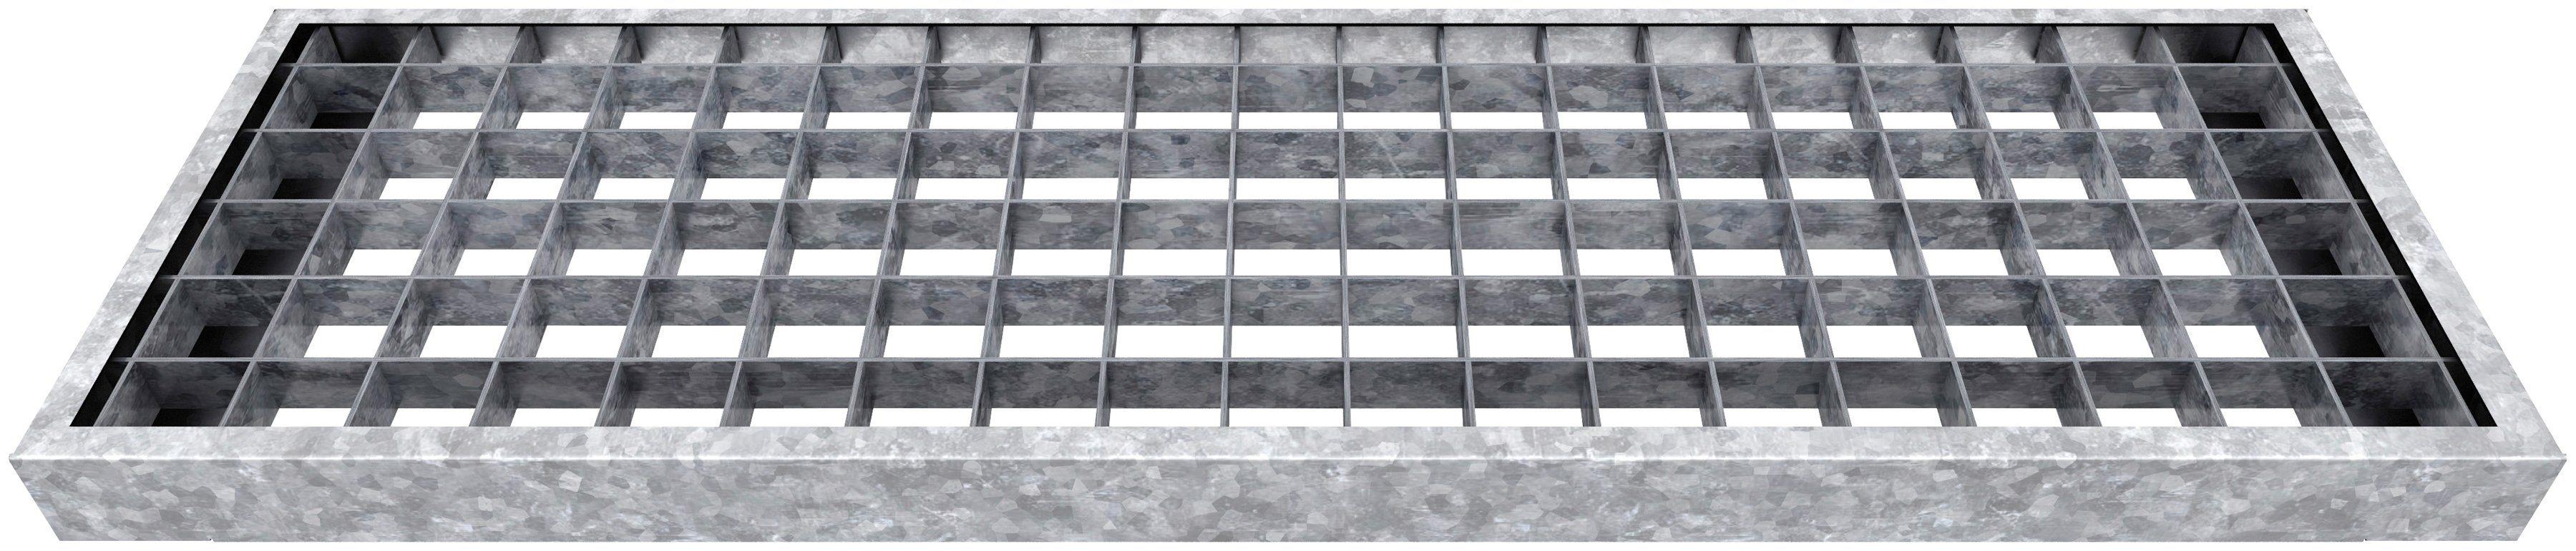 DOLLE Gitterroststufe »Gardentop«, BxTxH: 100x23x3 cm